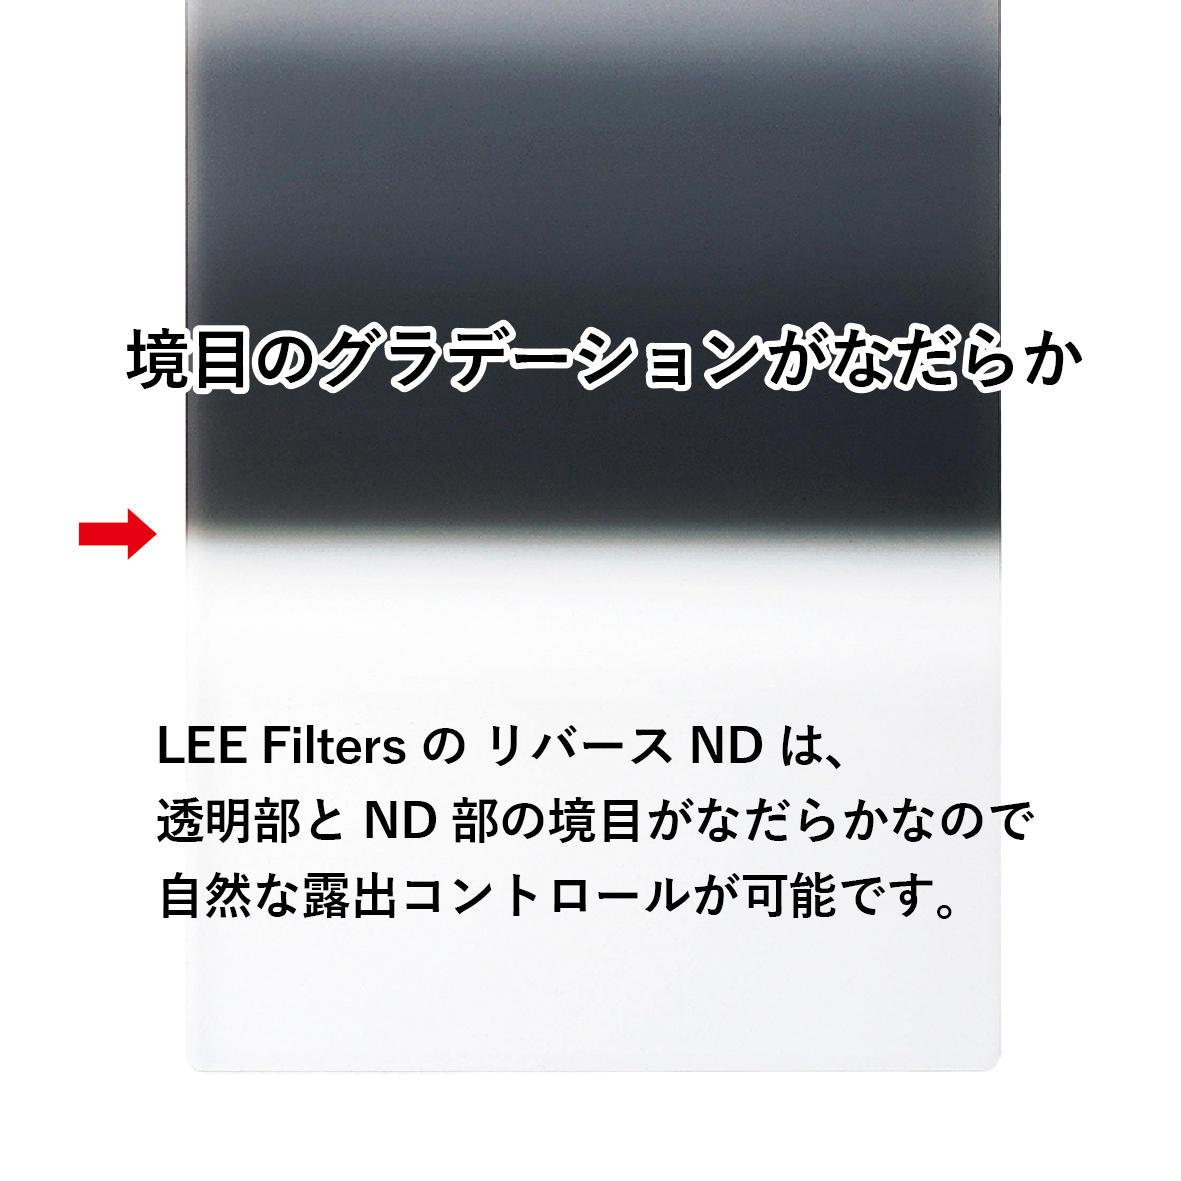 http://www.kenko-tokina.co.jp/imaging/filter/mt-images/5055782240095_image04.jpg